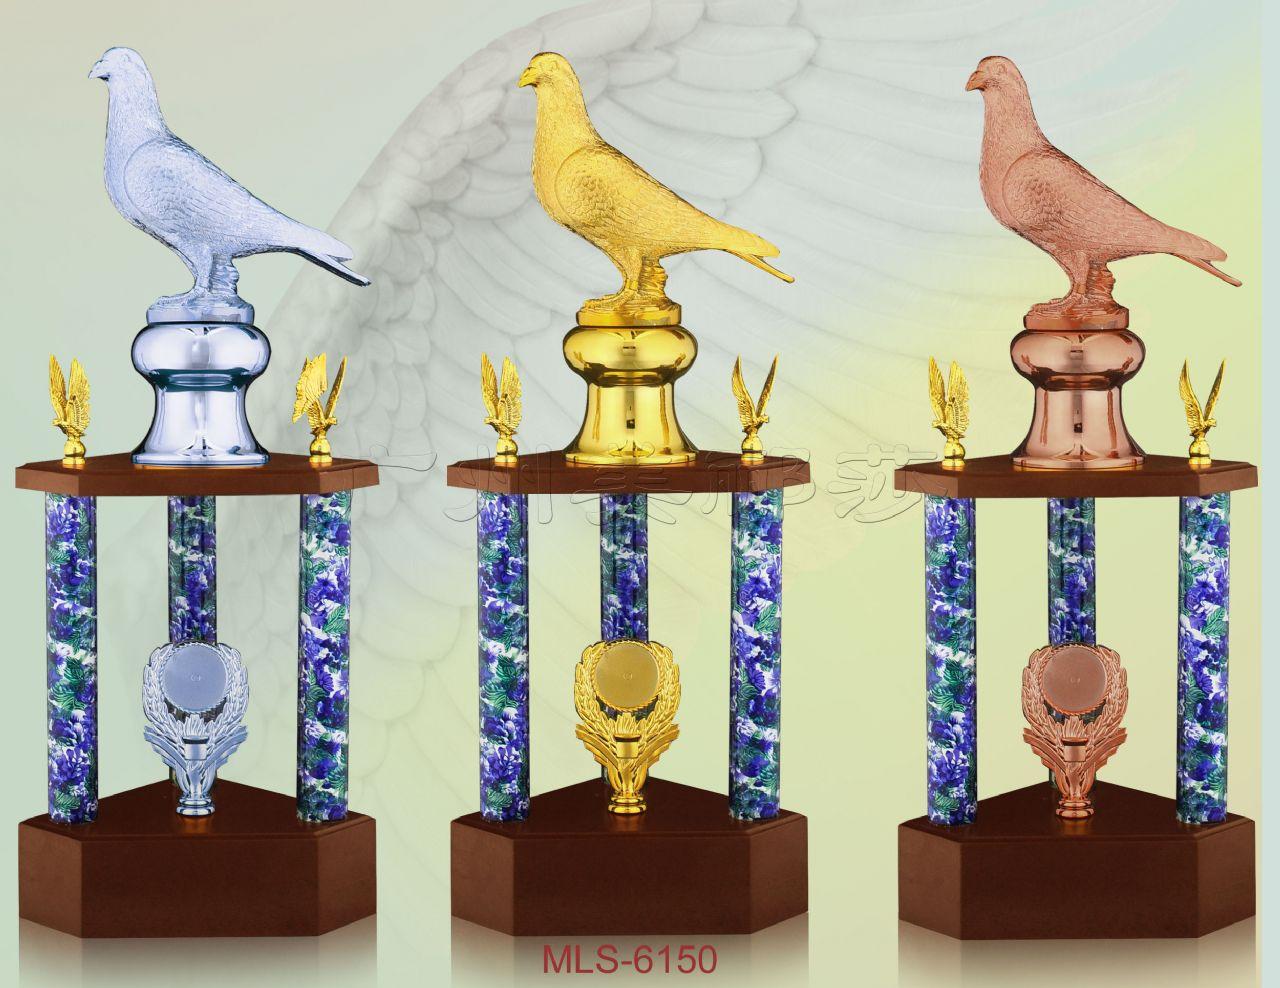 MLS-6150 三柱鸽子奖杯